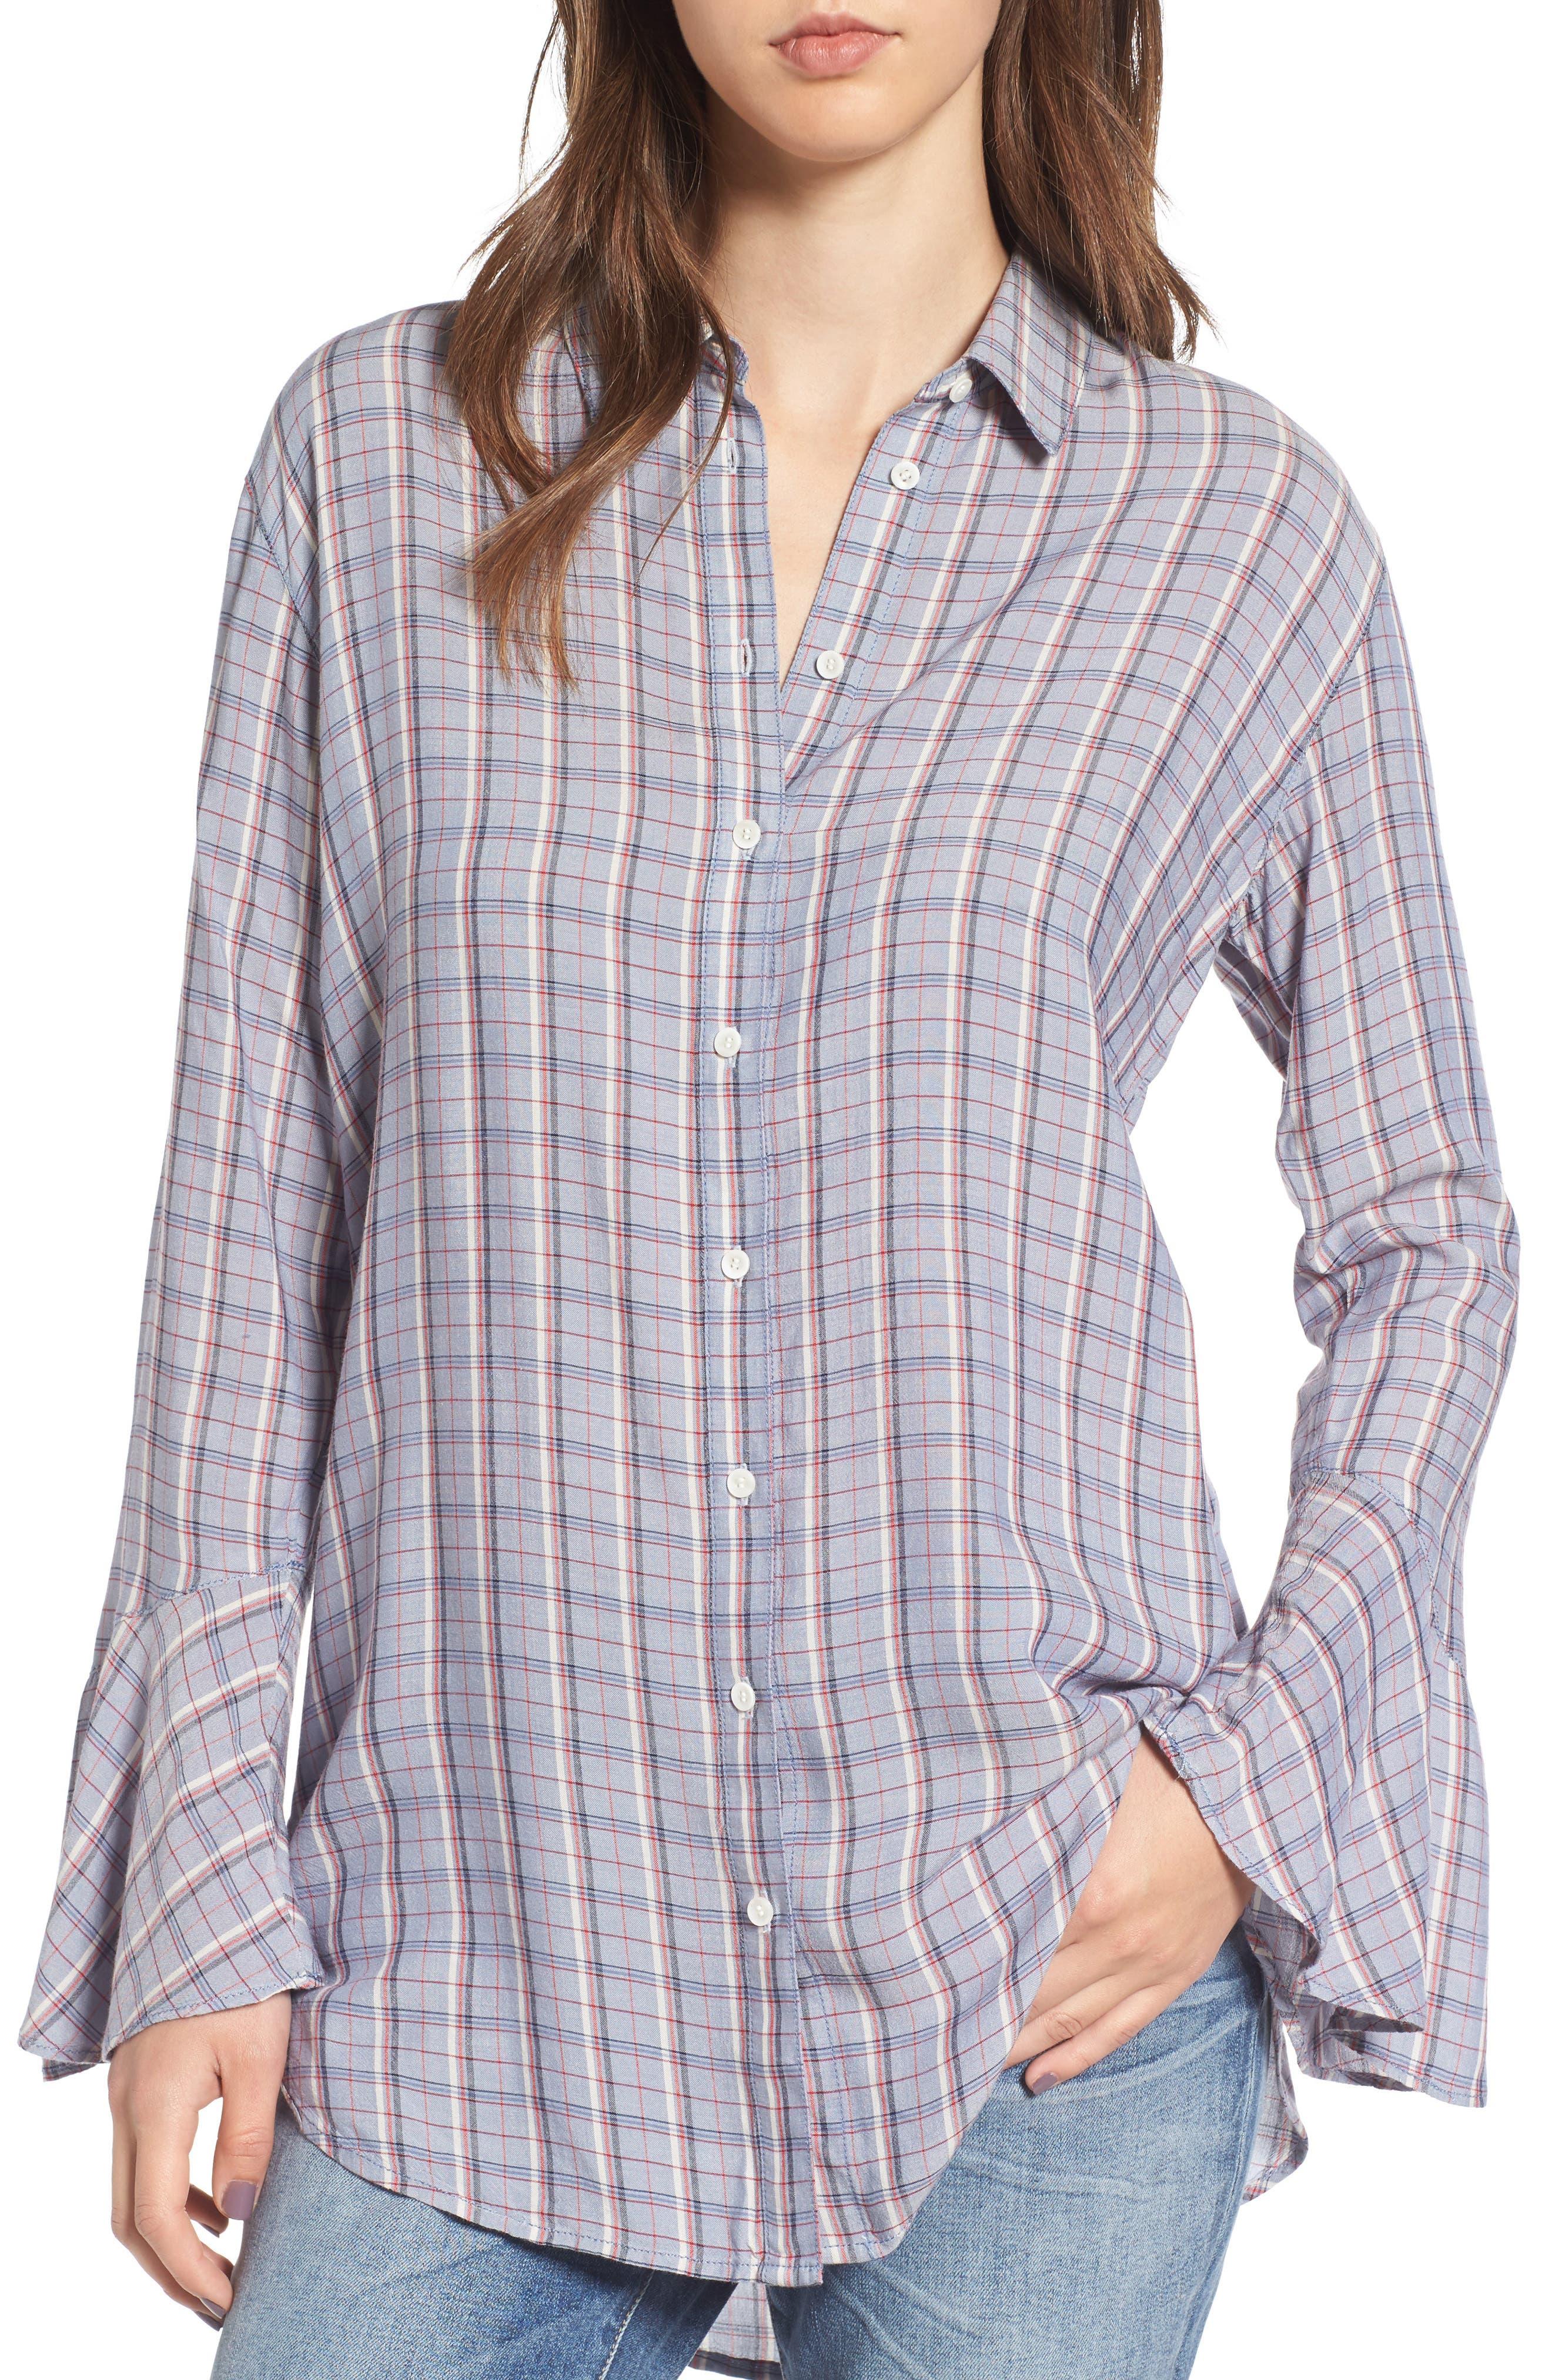 Alternate Image 1 Selected - Treasure & Bond Plaid Drapey Shirt